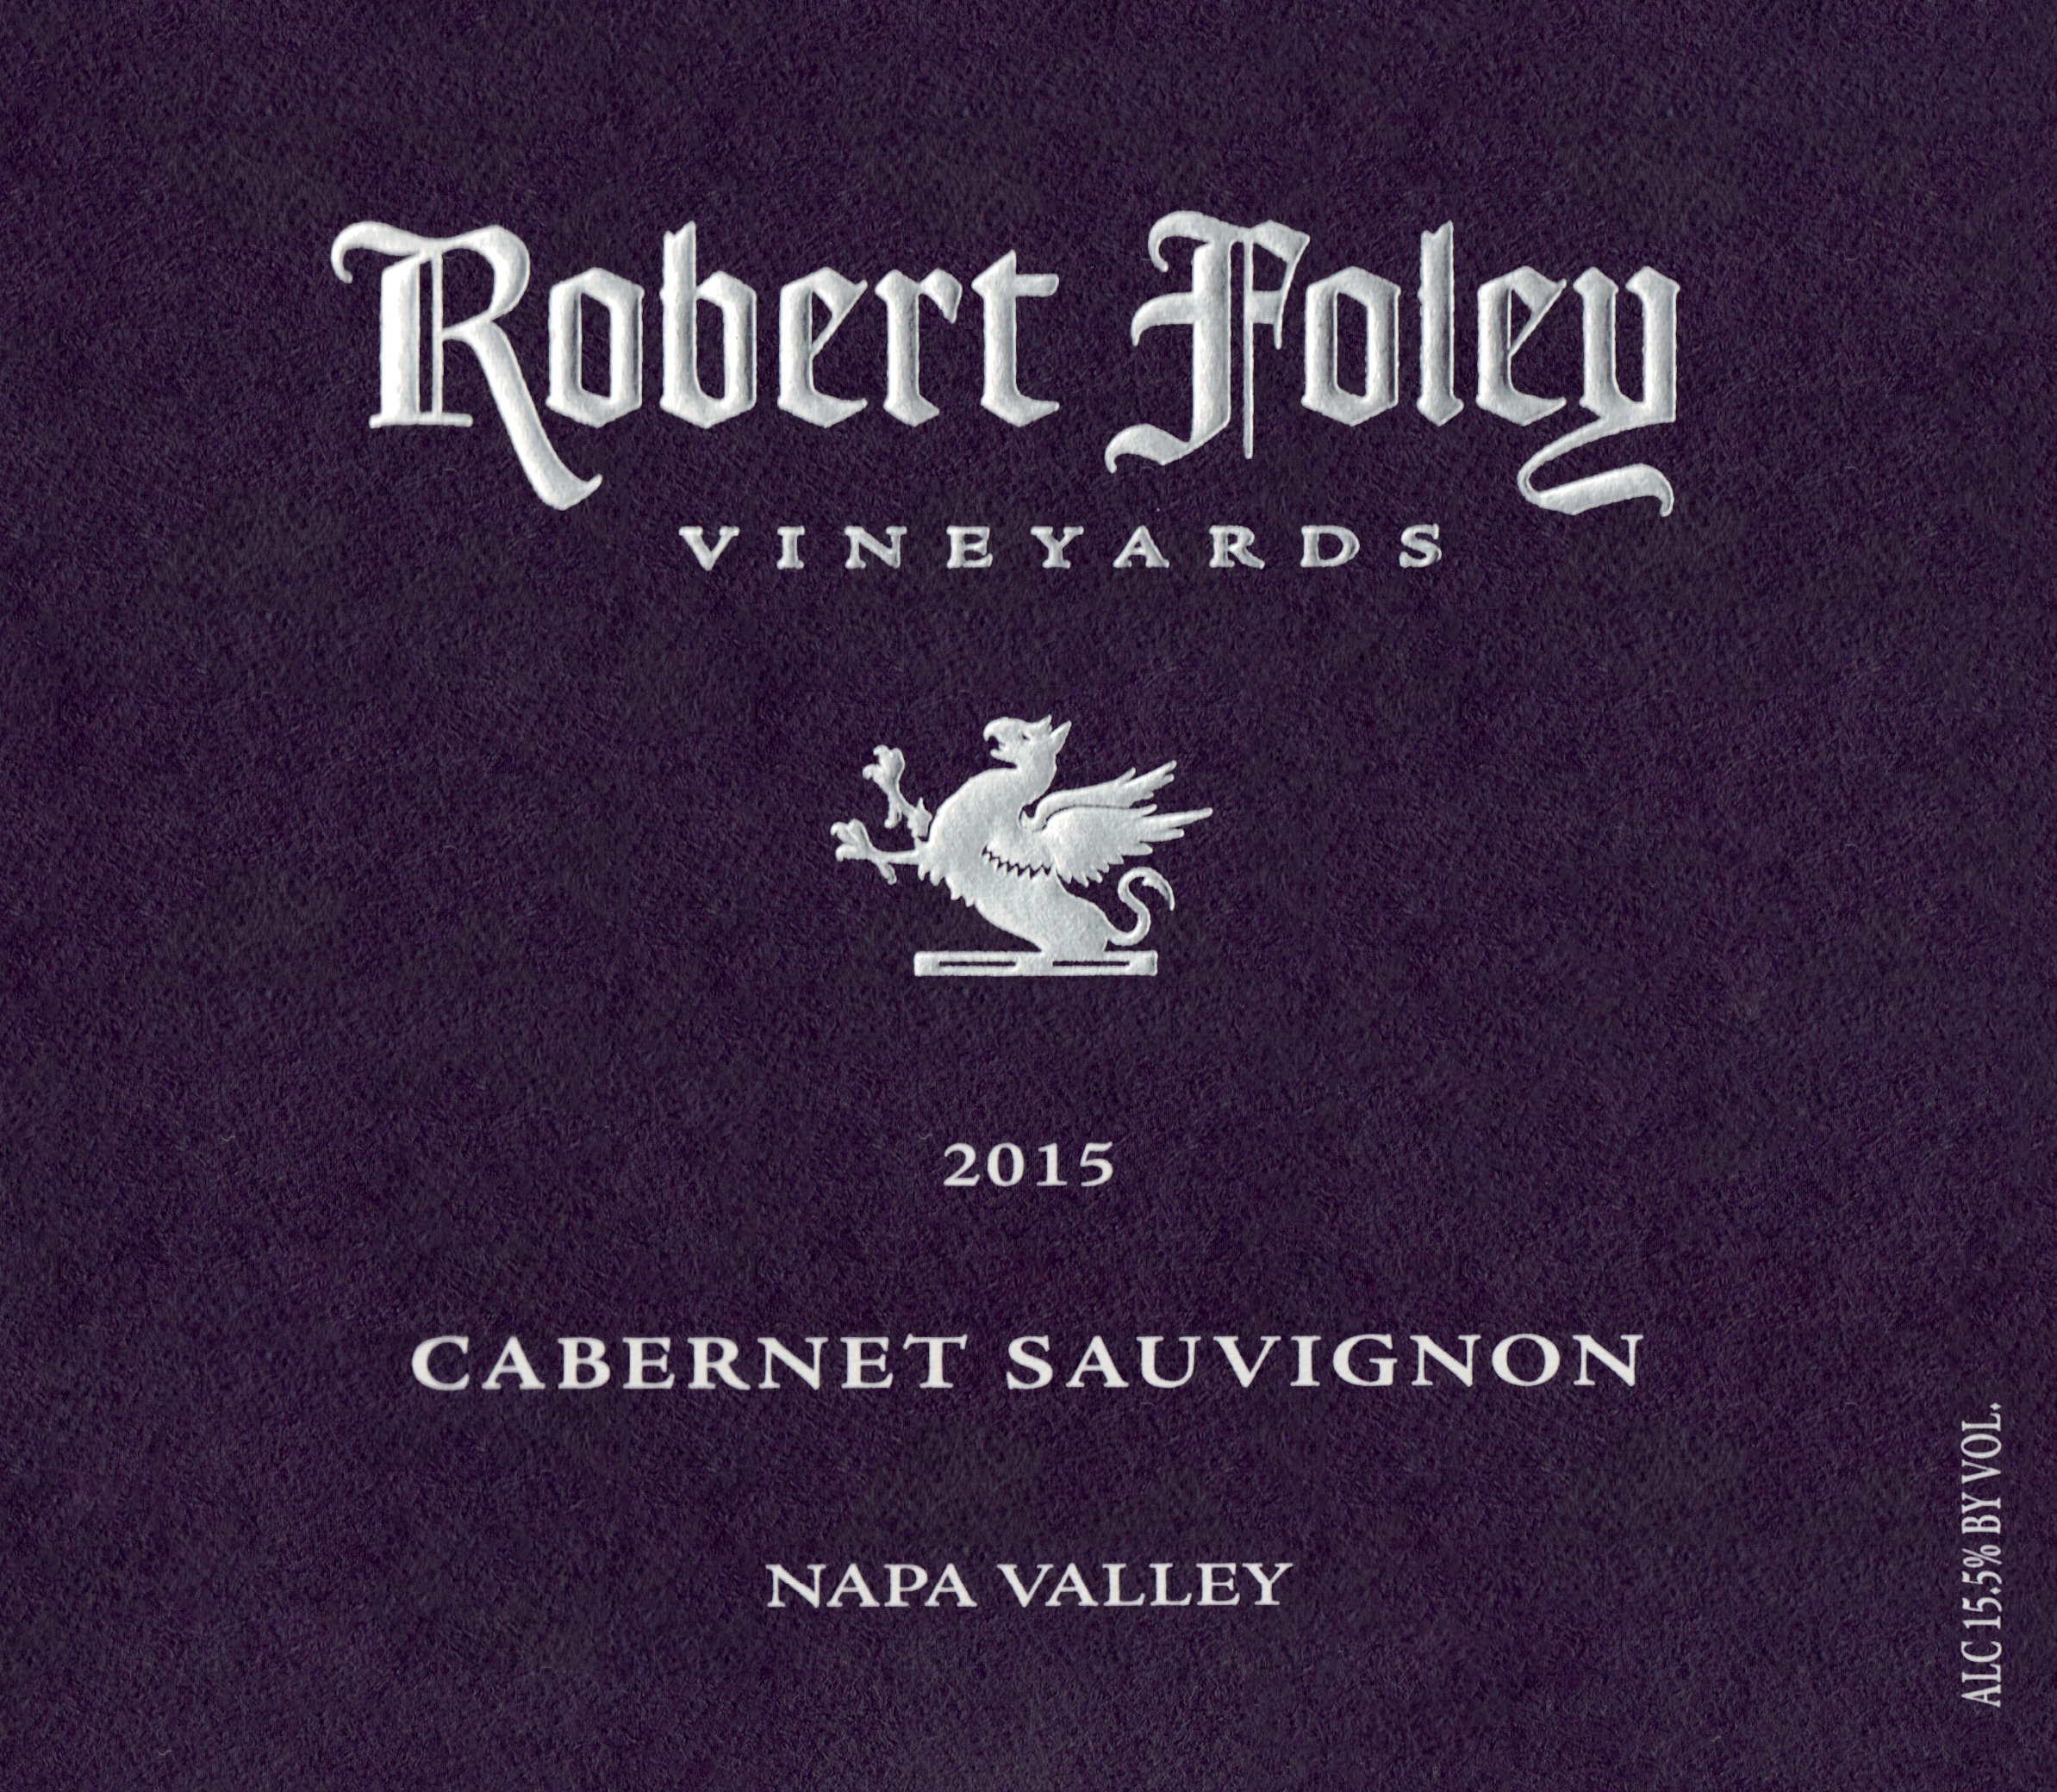 Robert Foley Vineyards Cabernet Sauvignon Napa 2015